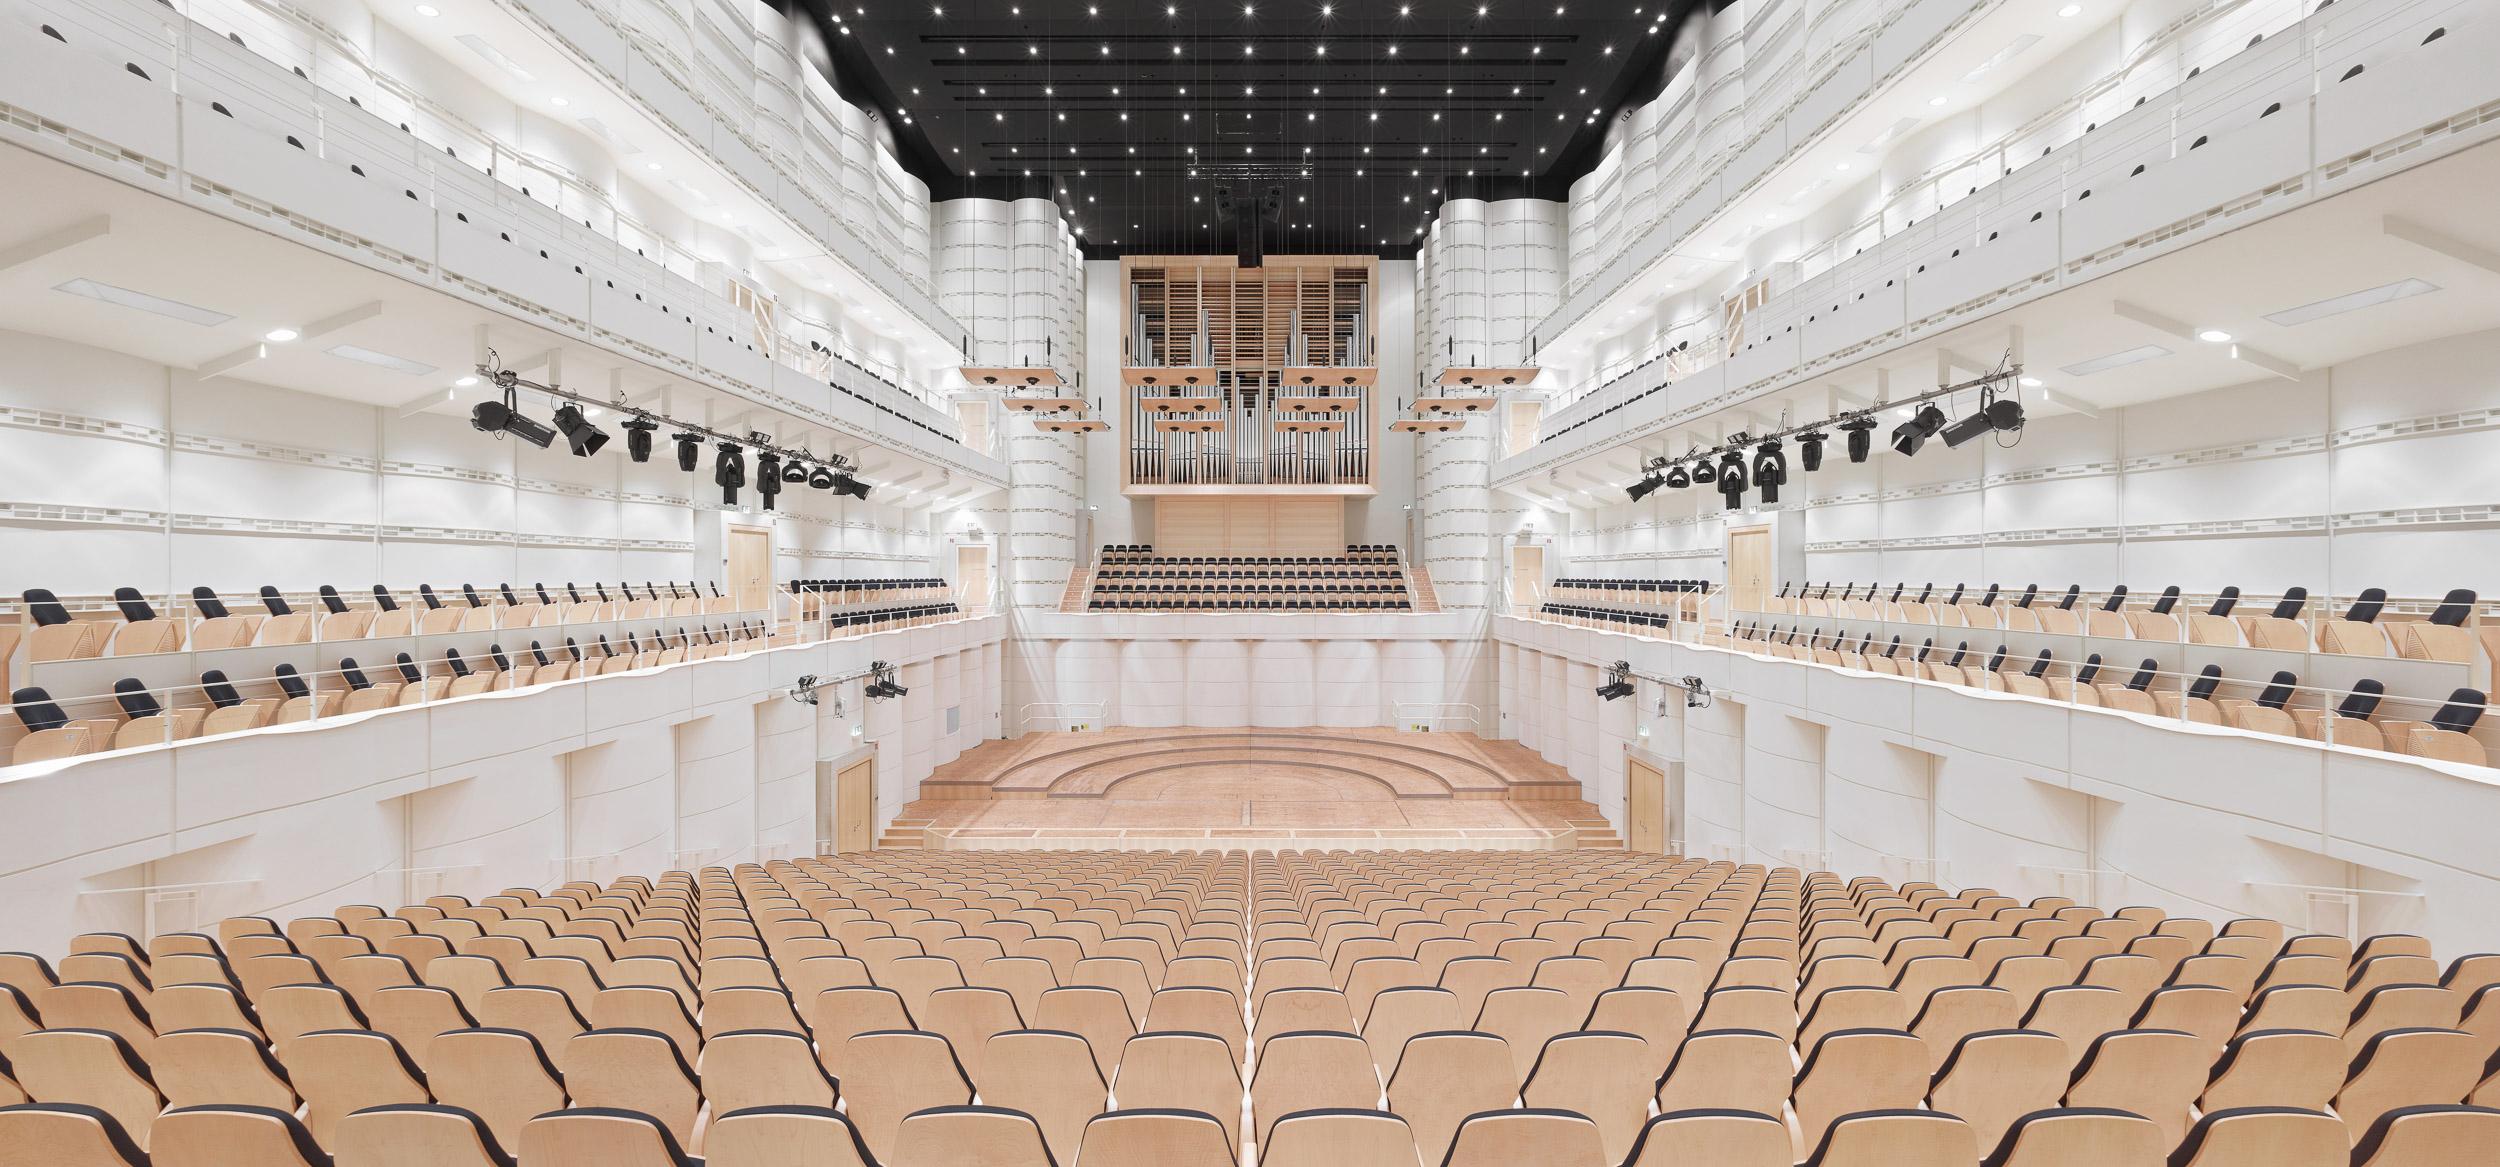 008-Konzerthaus-DO_001.jpg